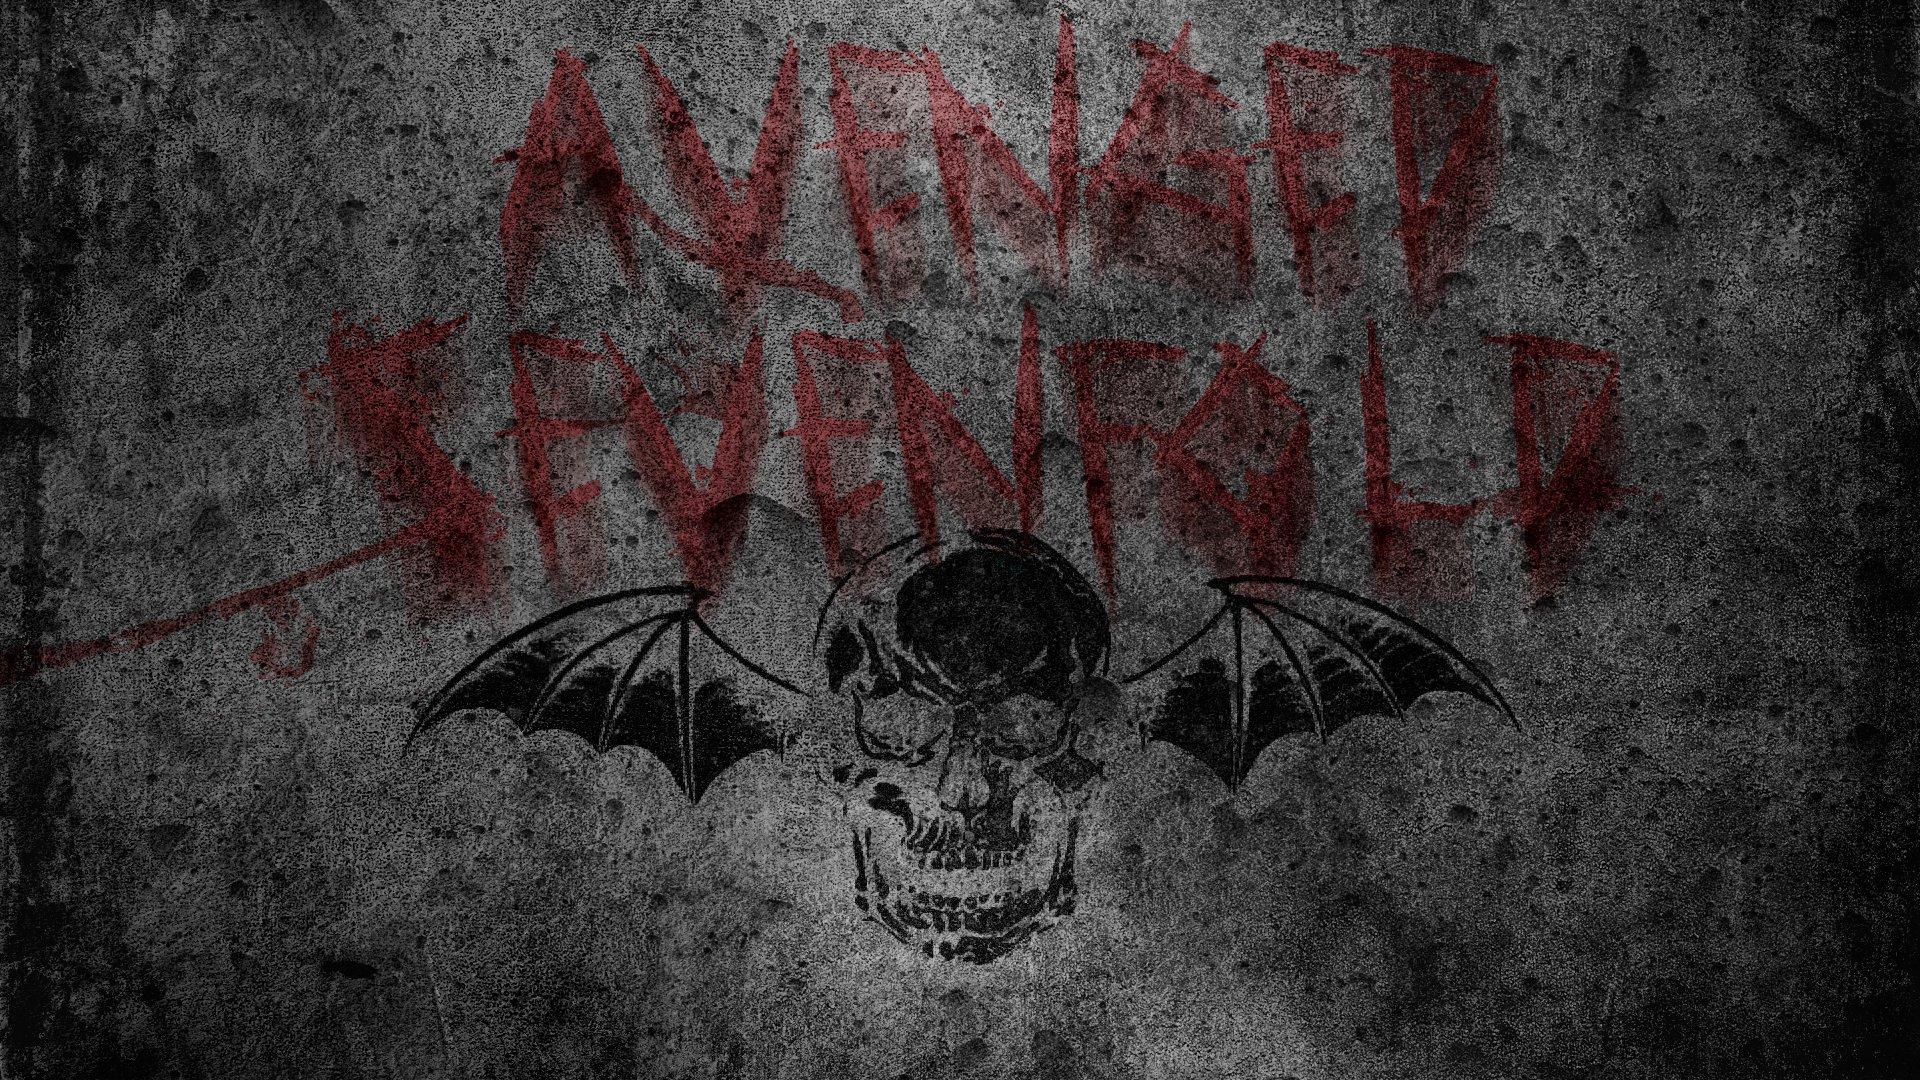 Avenged Sevenfold Wallpaper by GreenHammock 1920x1080